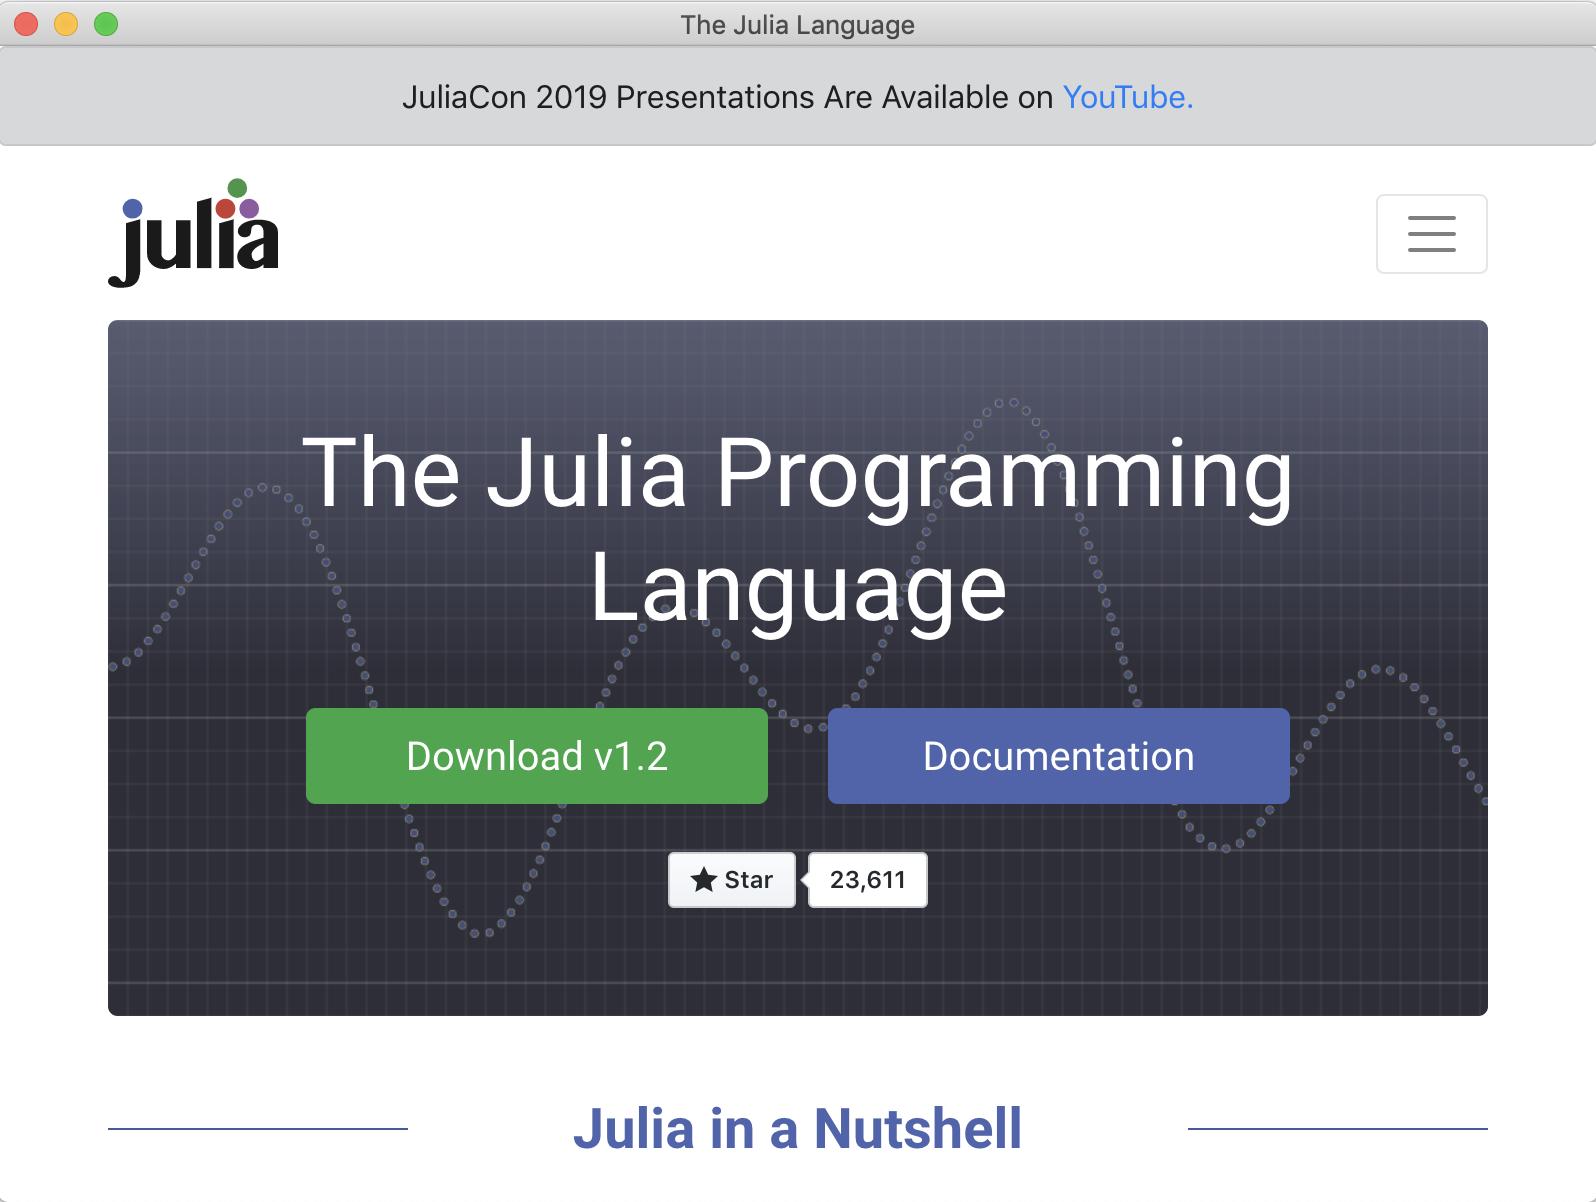 Blink Window showing the JuliaLang website